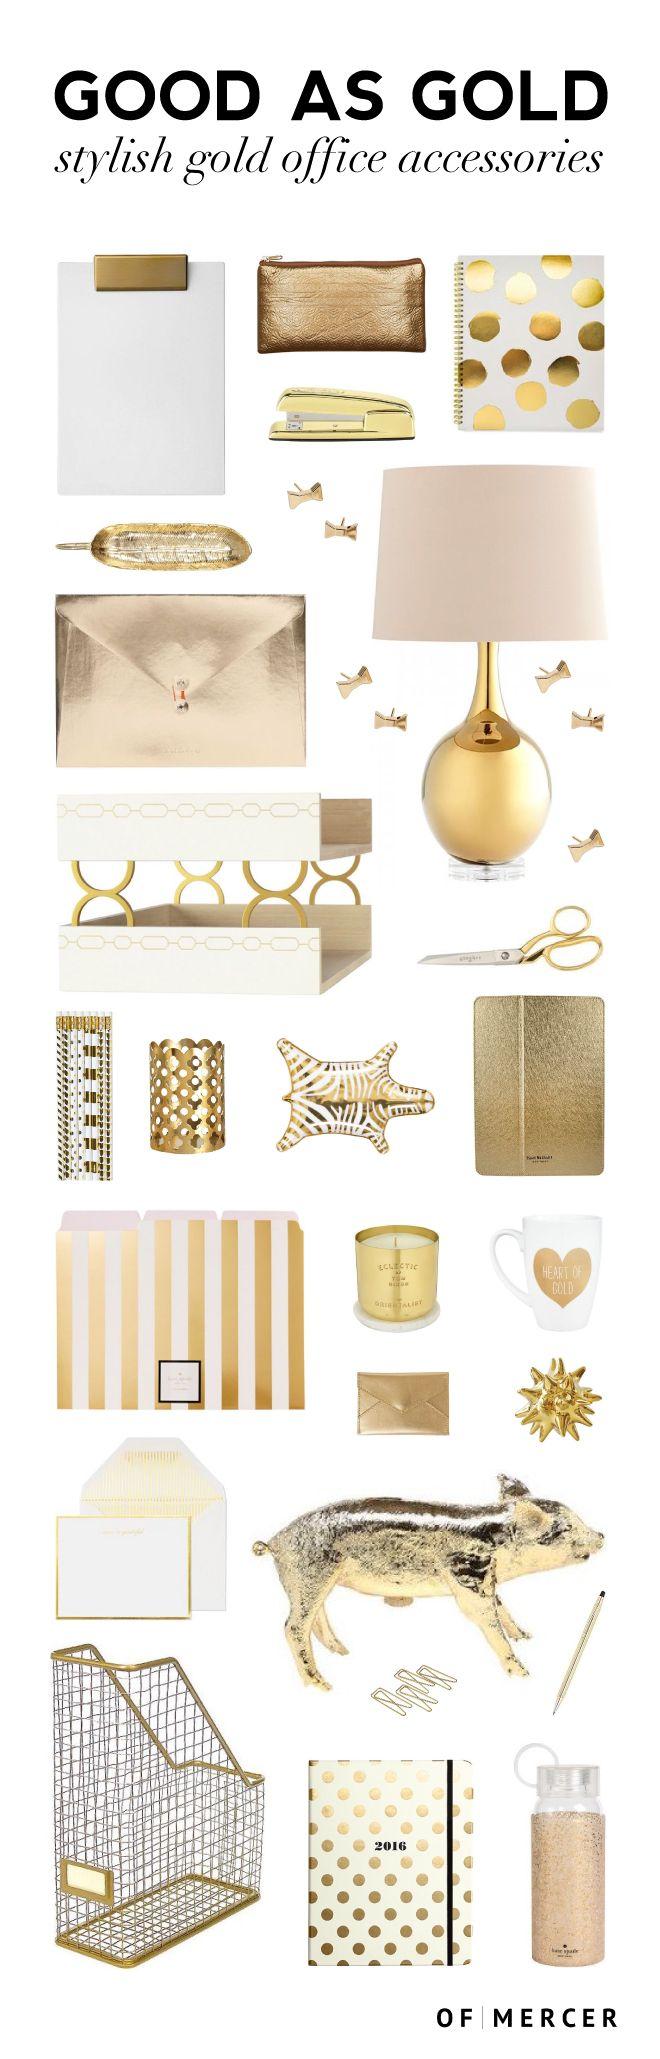 Good As Gold Decor Desk Decor Gold Office Accessories